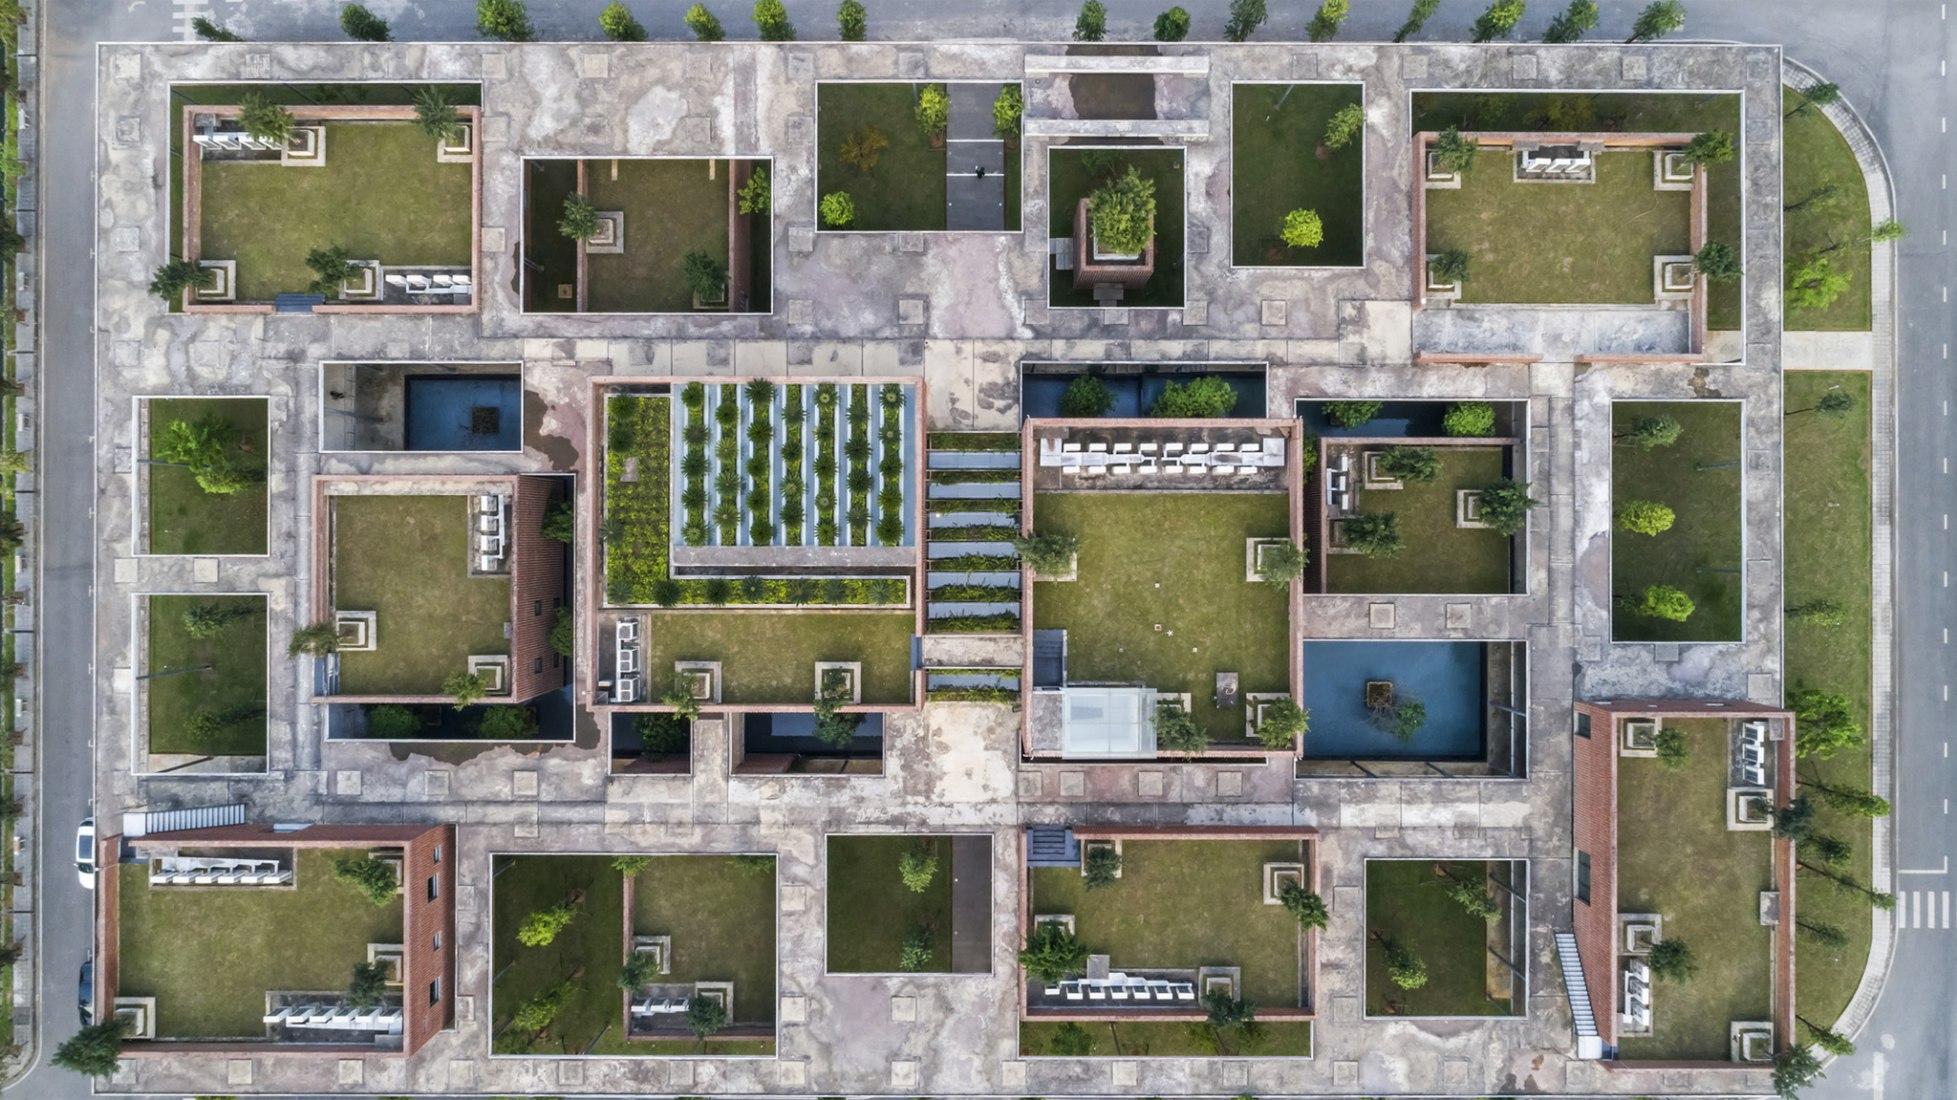 Viettel Academy educational center by VTN Architects. Photograph by Hiroyuki Oki